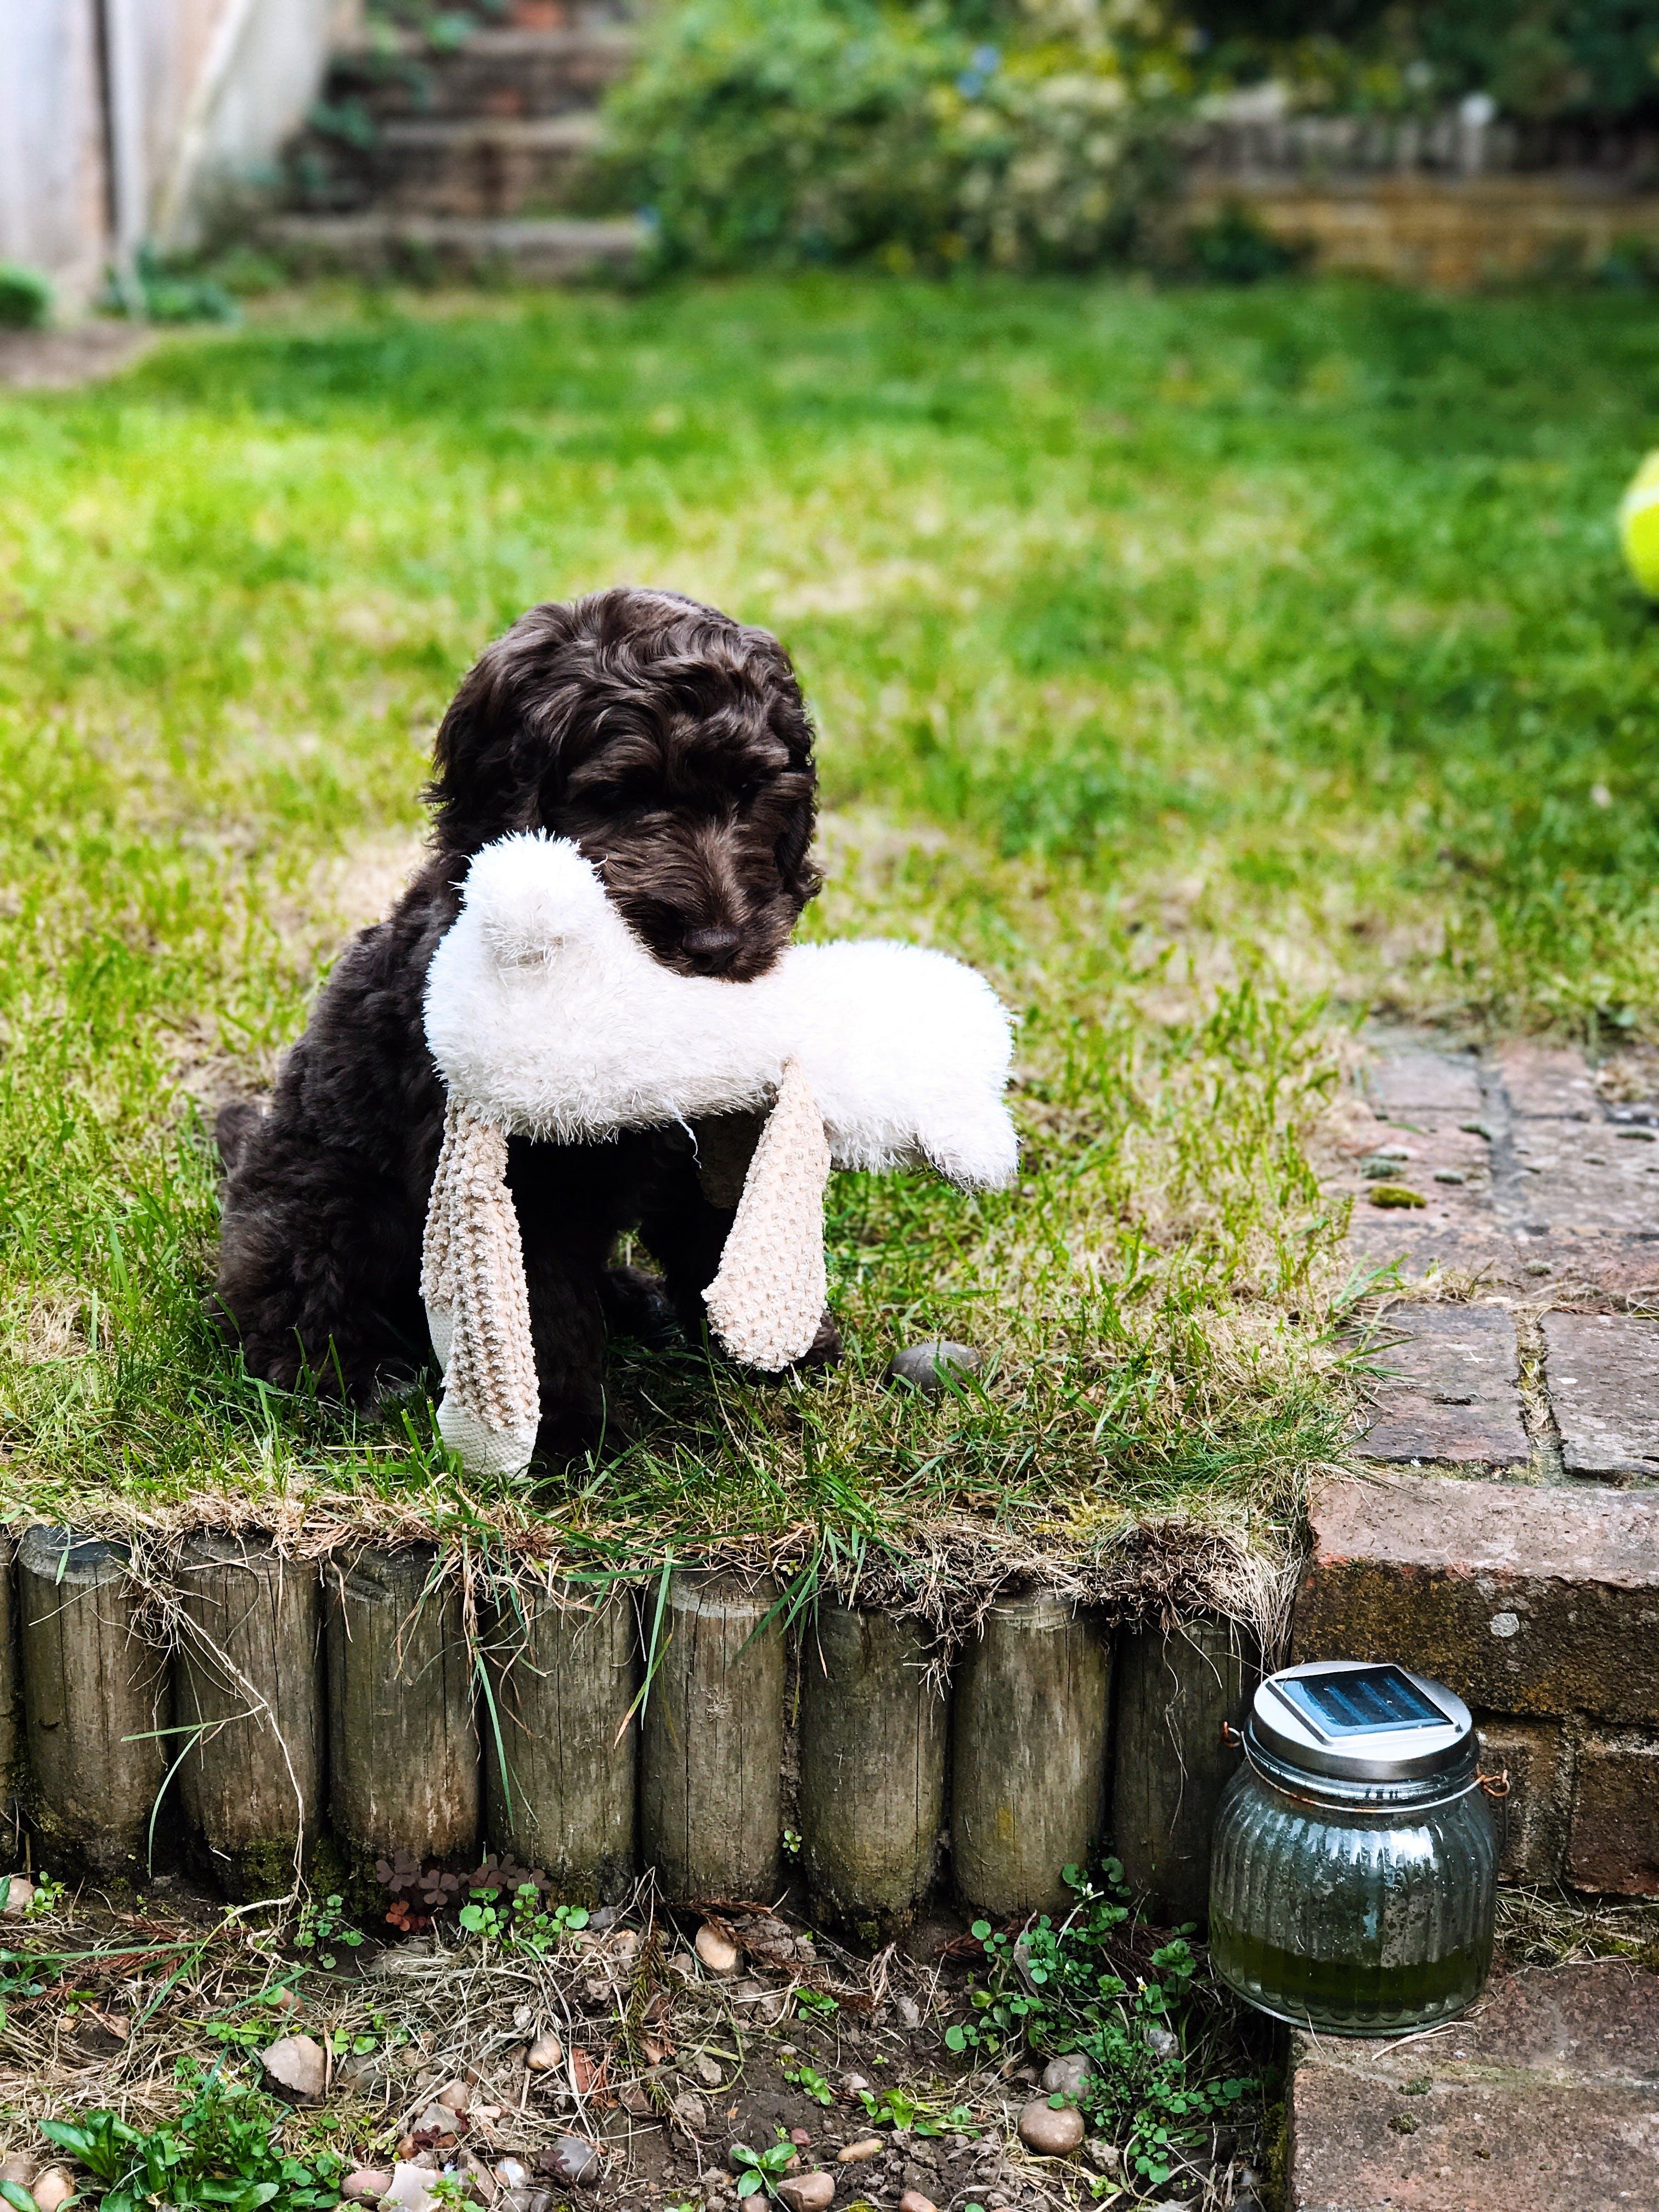 Free stock photo of cockapoo, dog, garden, grass